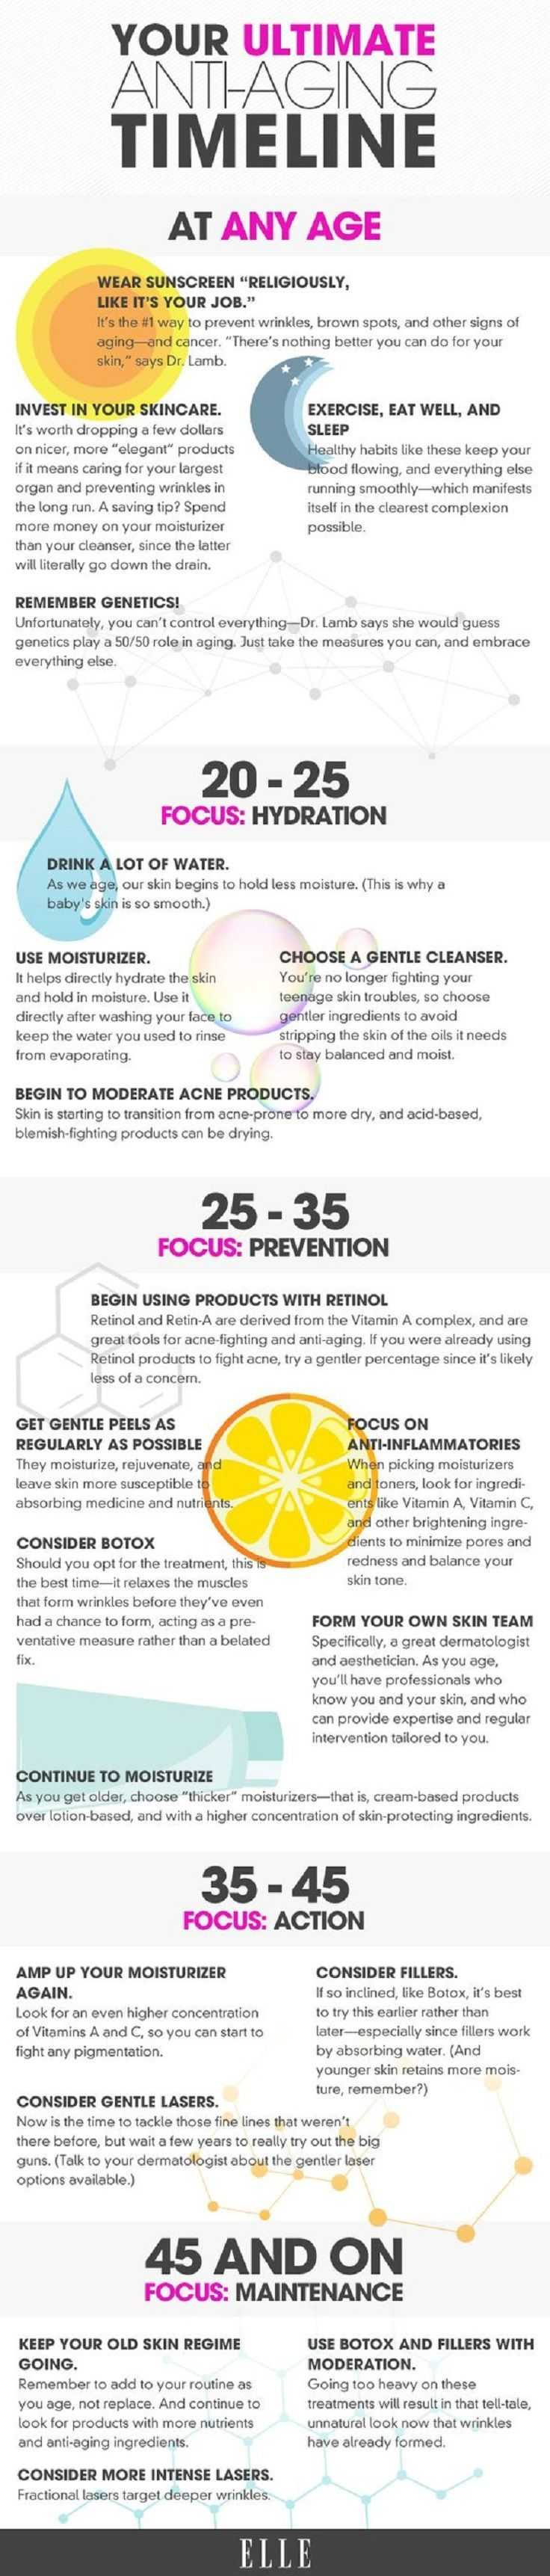 Anti-Aging Skincare Guide